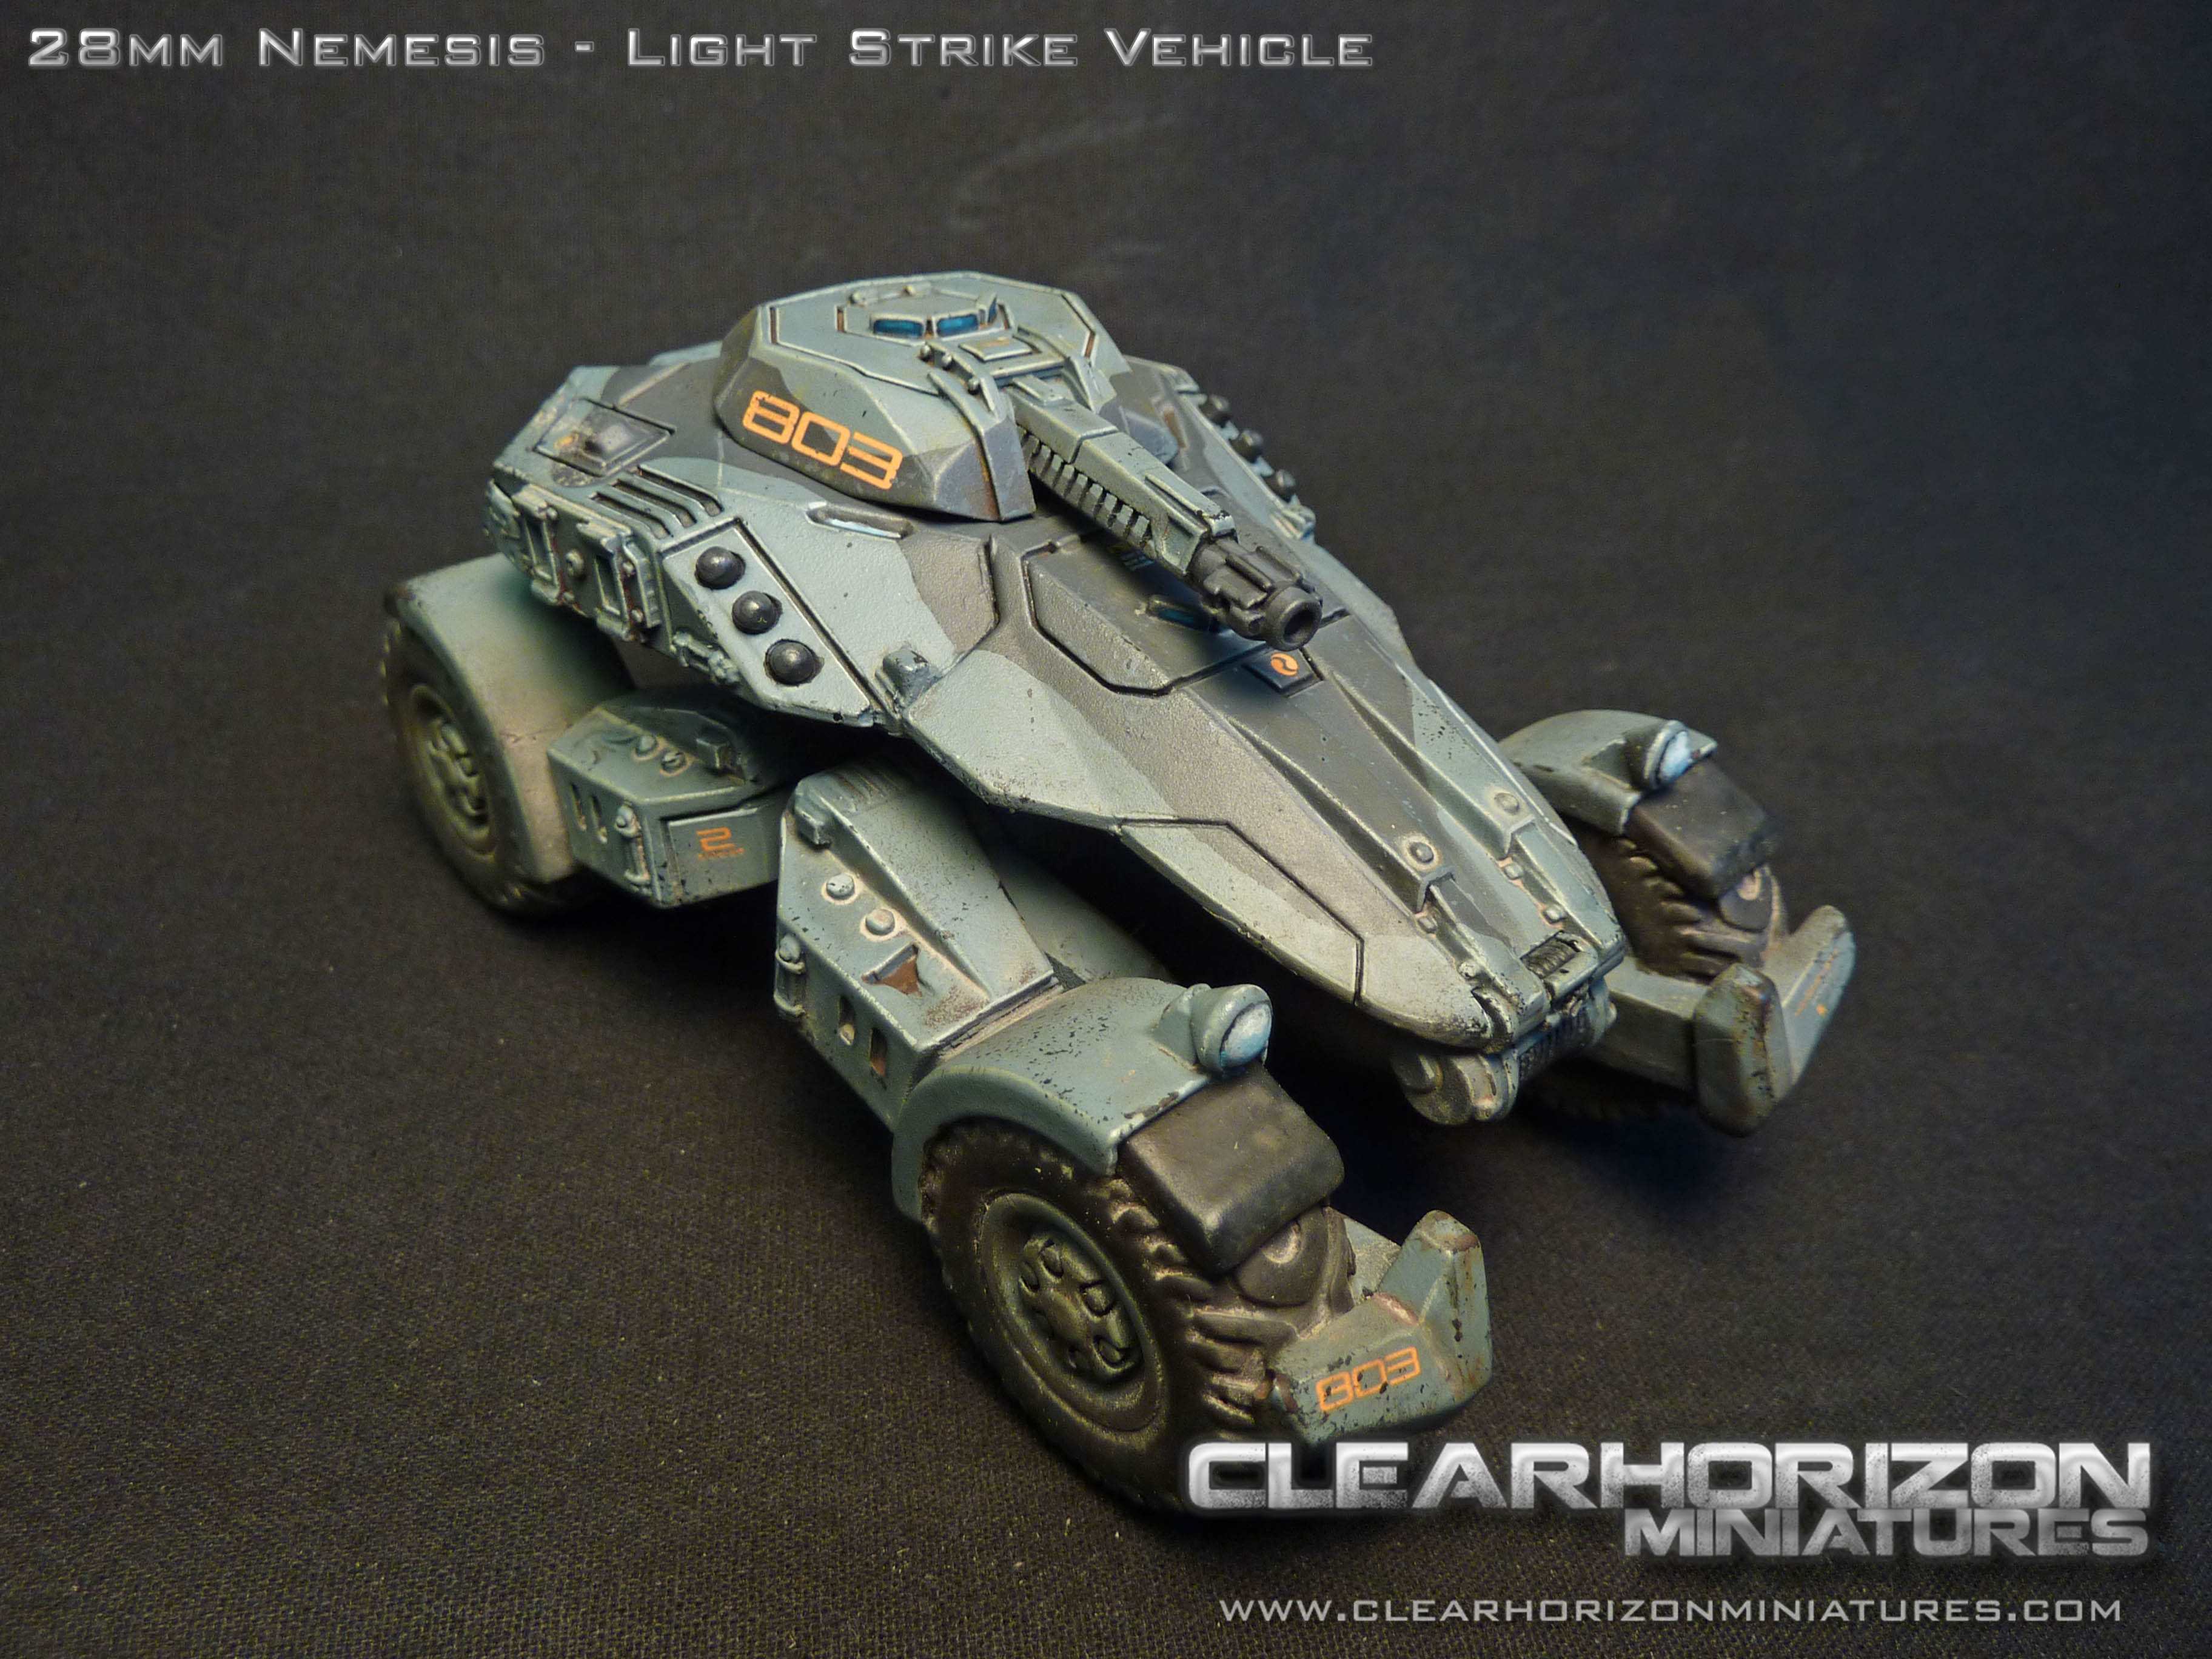 28mm nemesis light strike vehicle clearhorizon miniatures